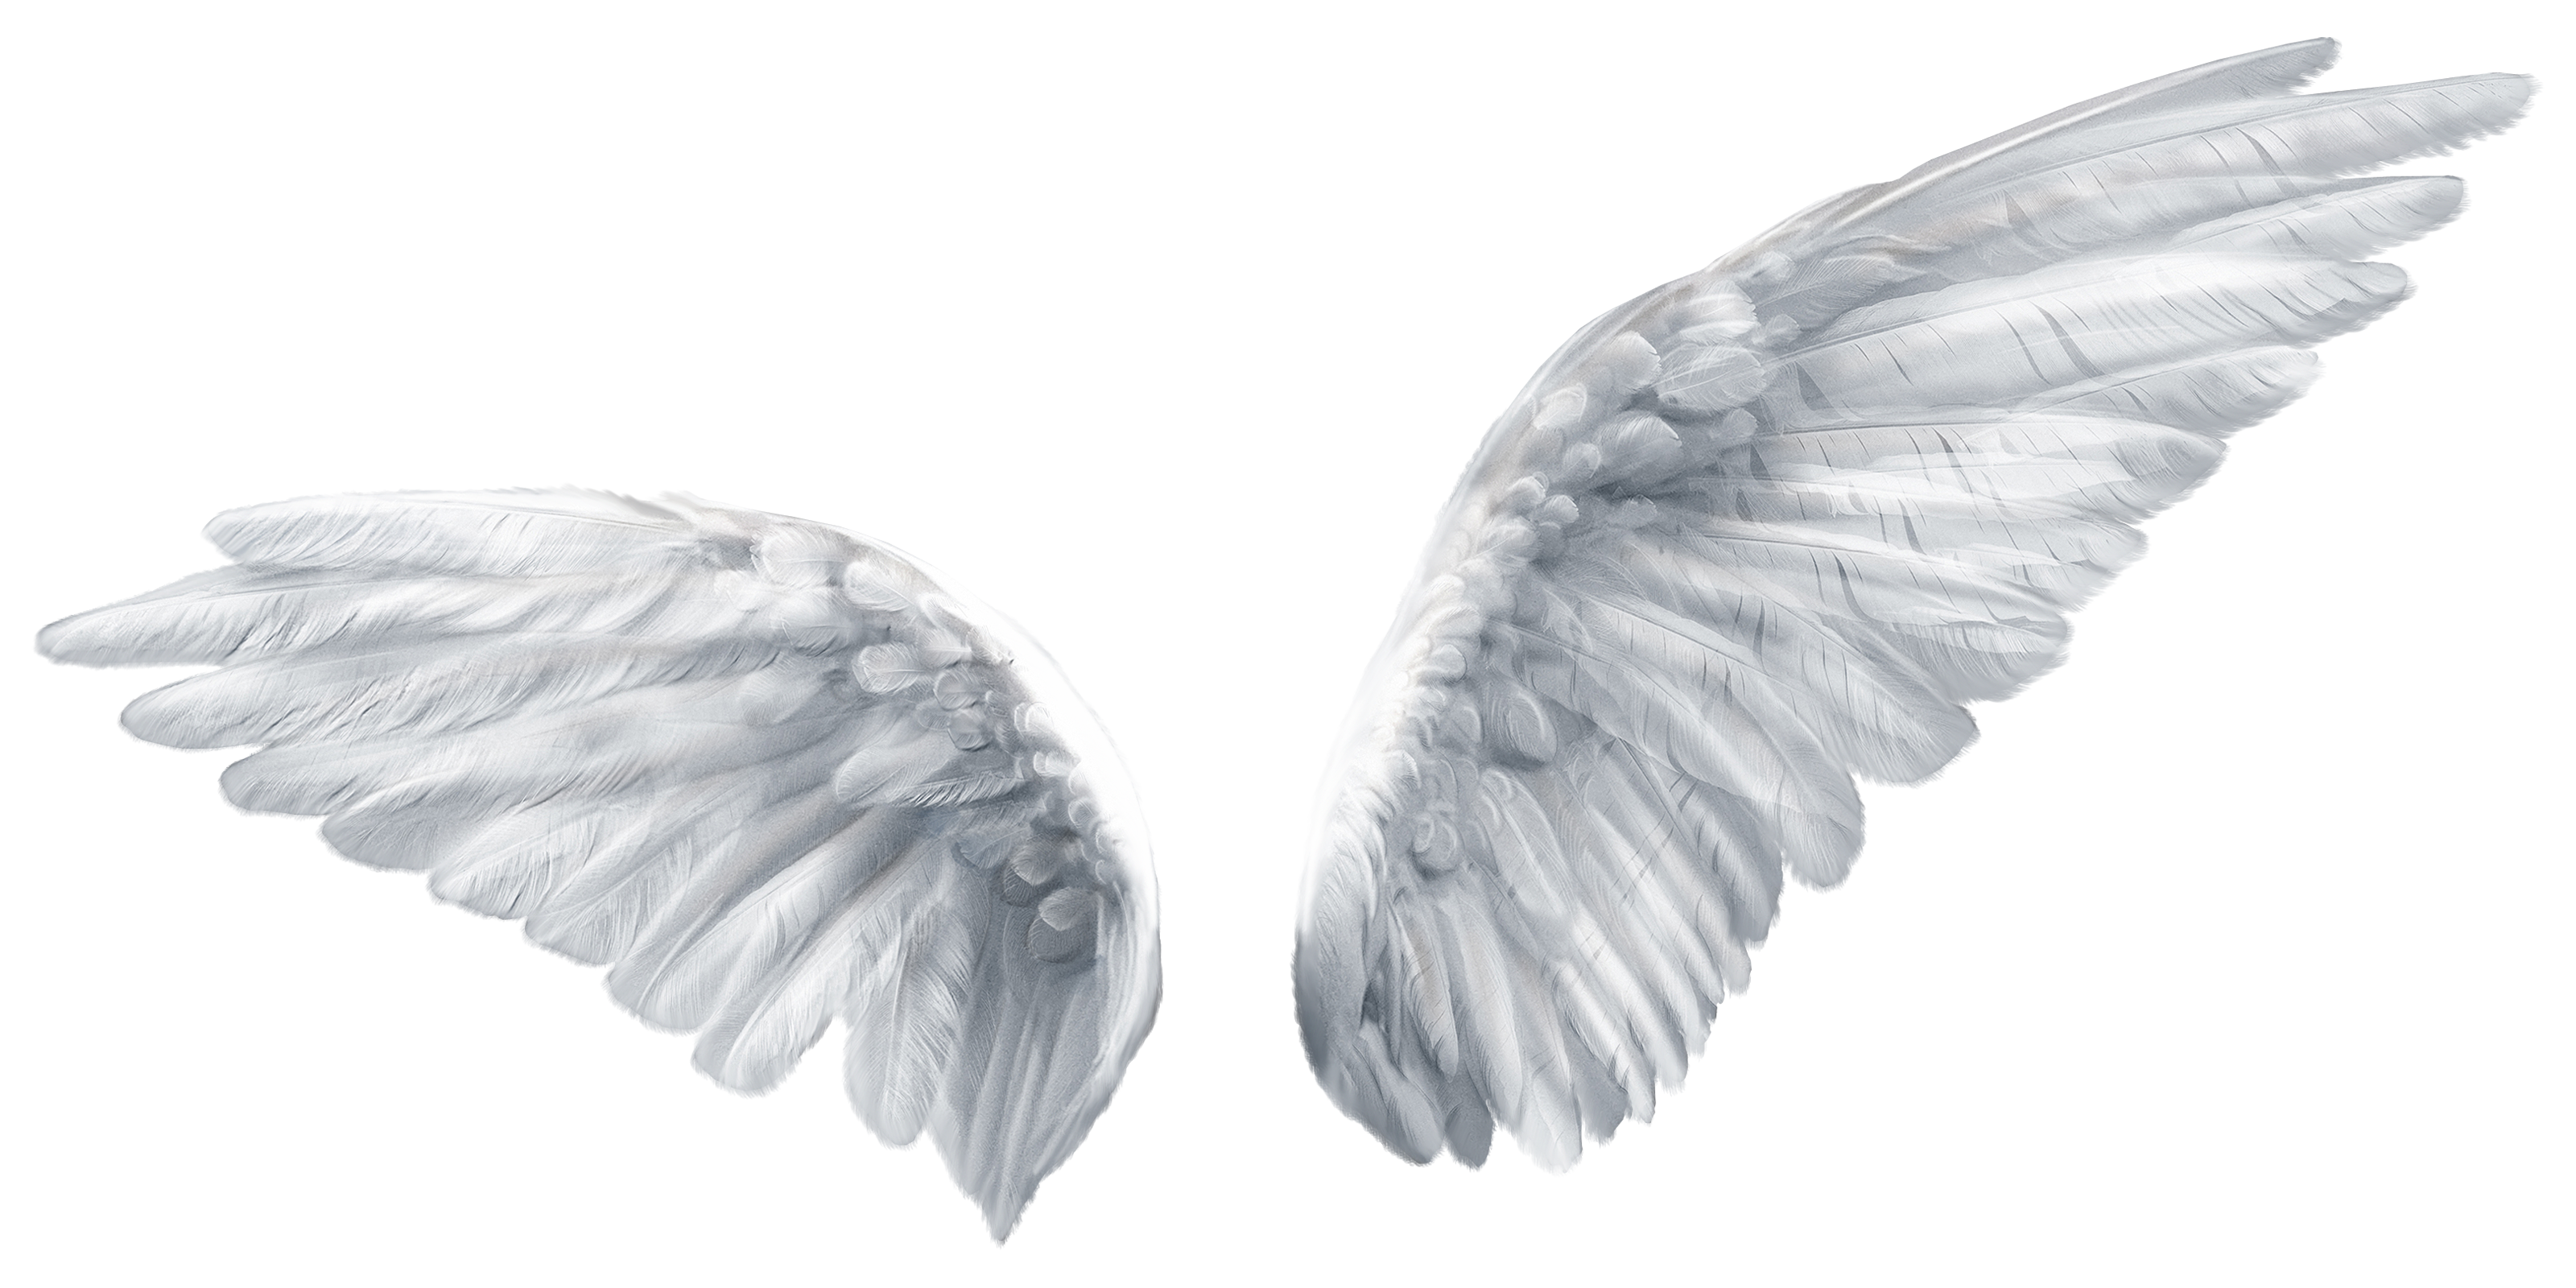 Wing Butterfly Angel Clip Art Angel Wings Png Download 3200 1600 Free Transparent Wing Png Download Clip Art L Krylya Eskizy Personazhej Domashnie Krysy